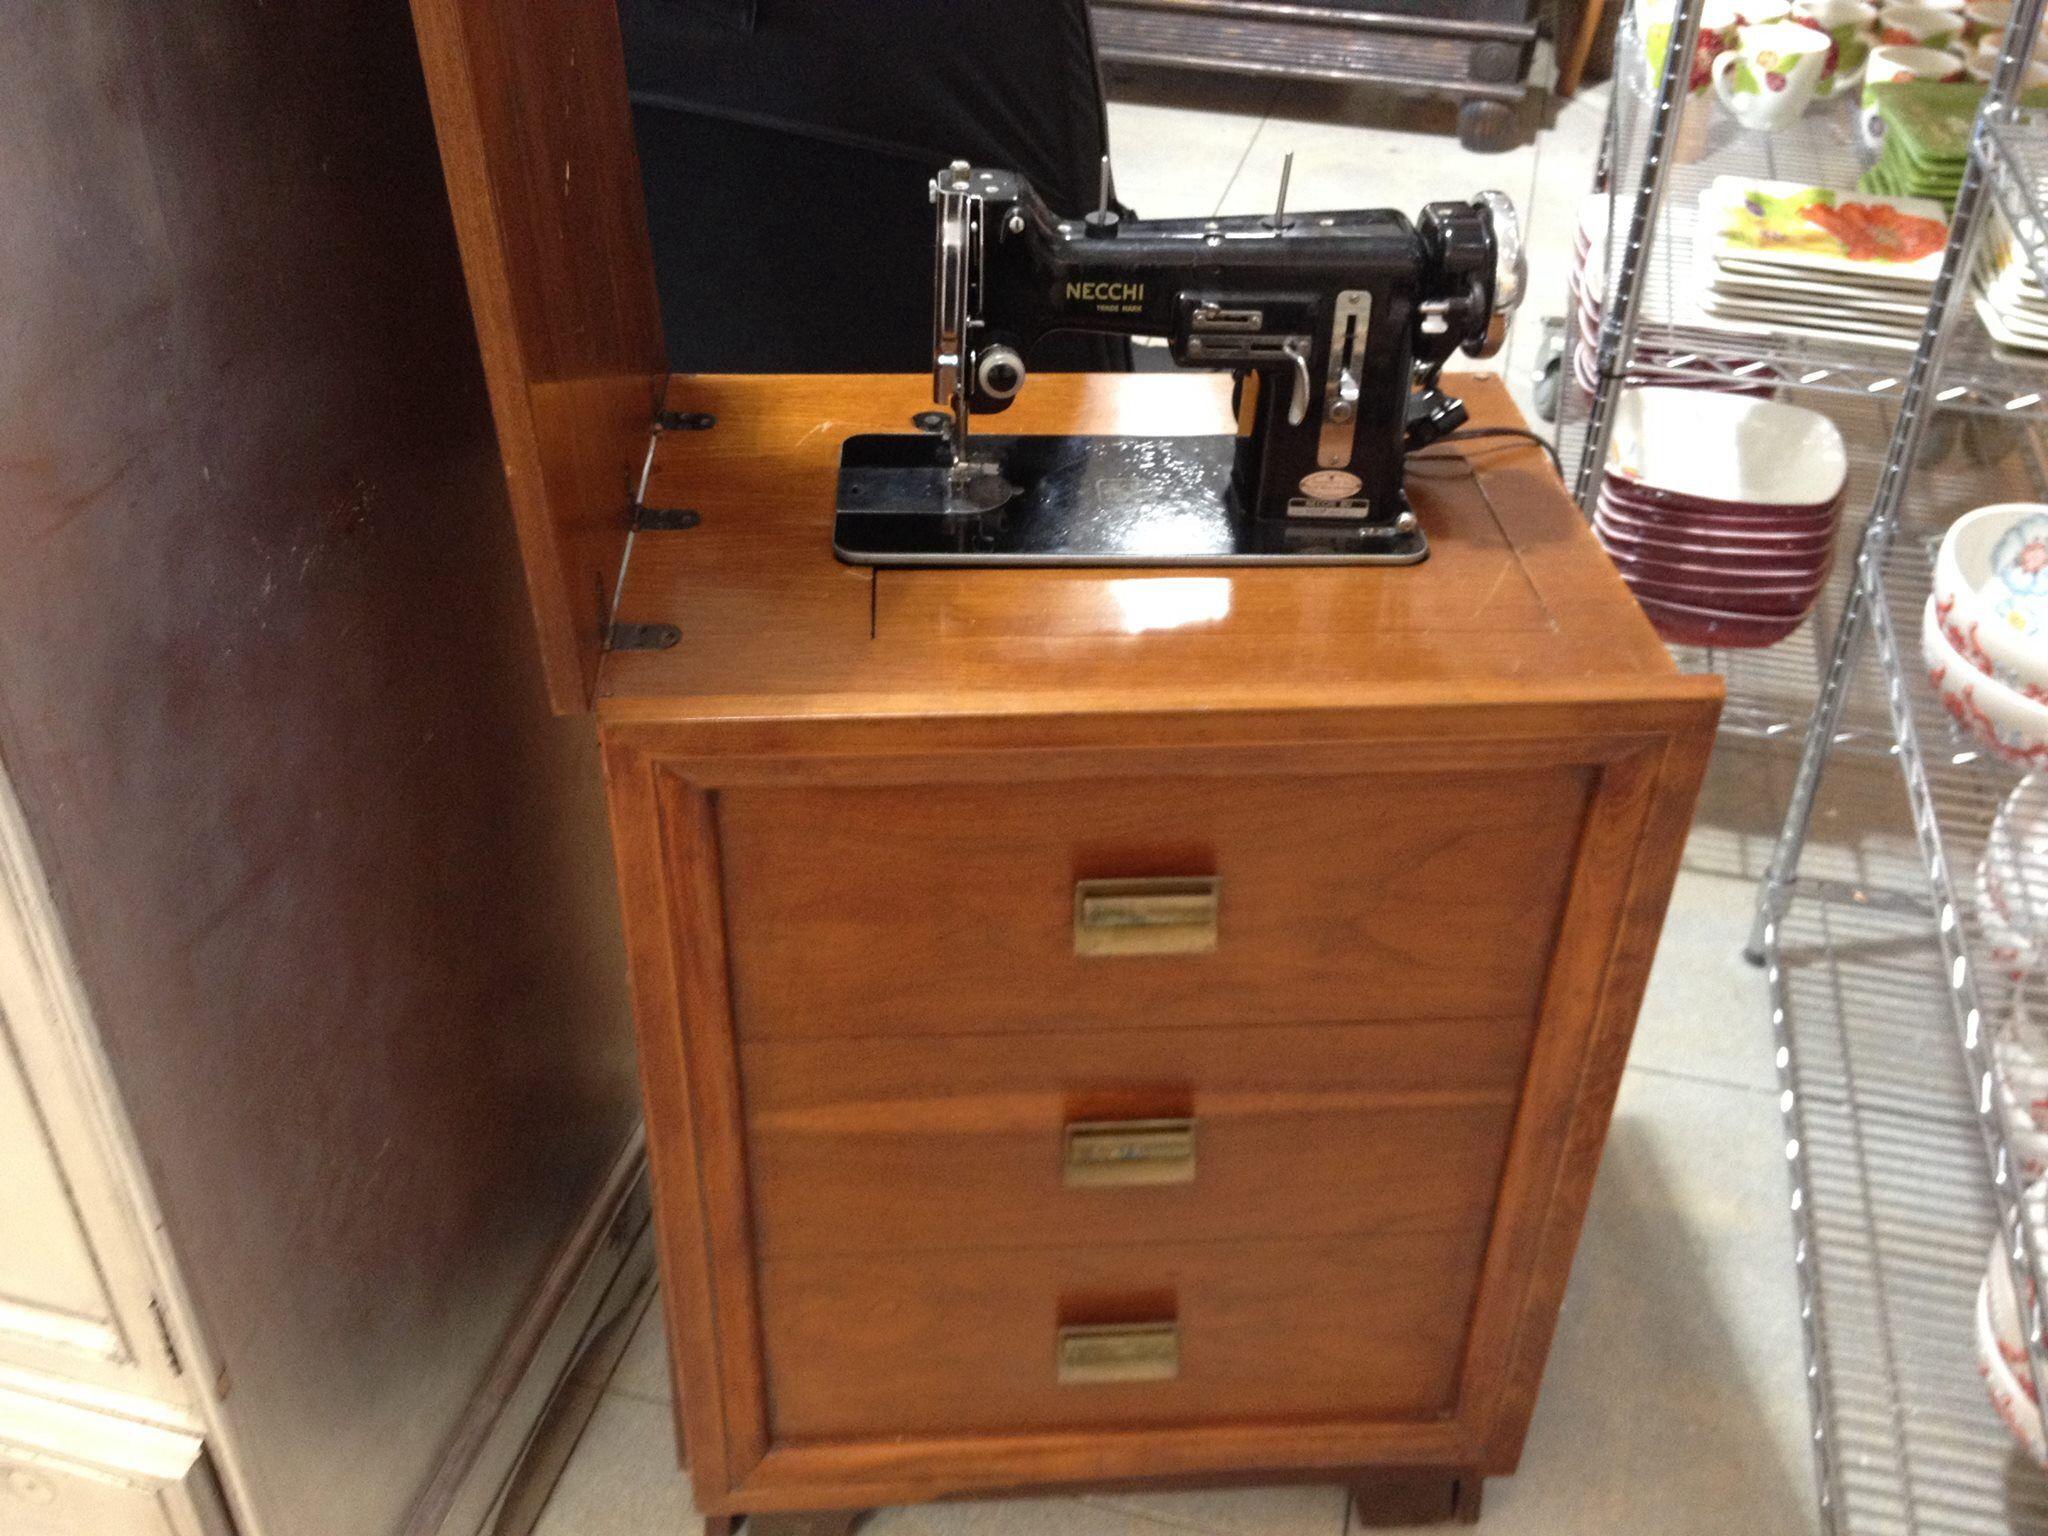 Antique Sewing Machines · Vintage Necchi in modern style cabinet & Vintage Necchi in modern style cabinet | Vintage Sewing Machines ...